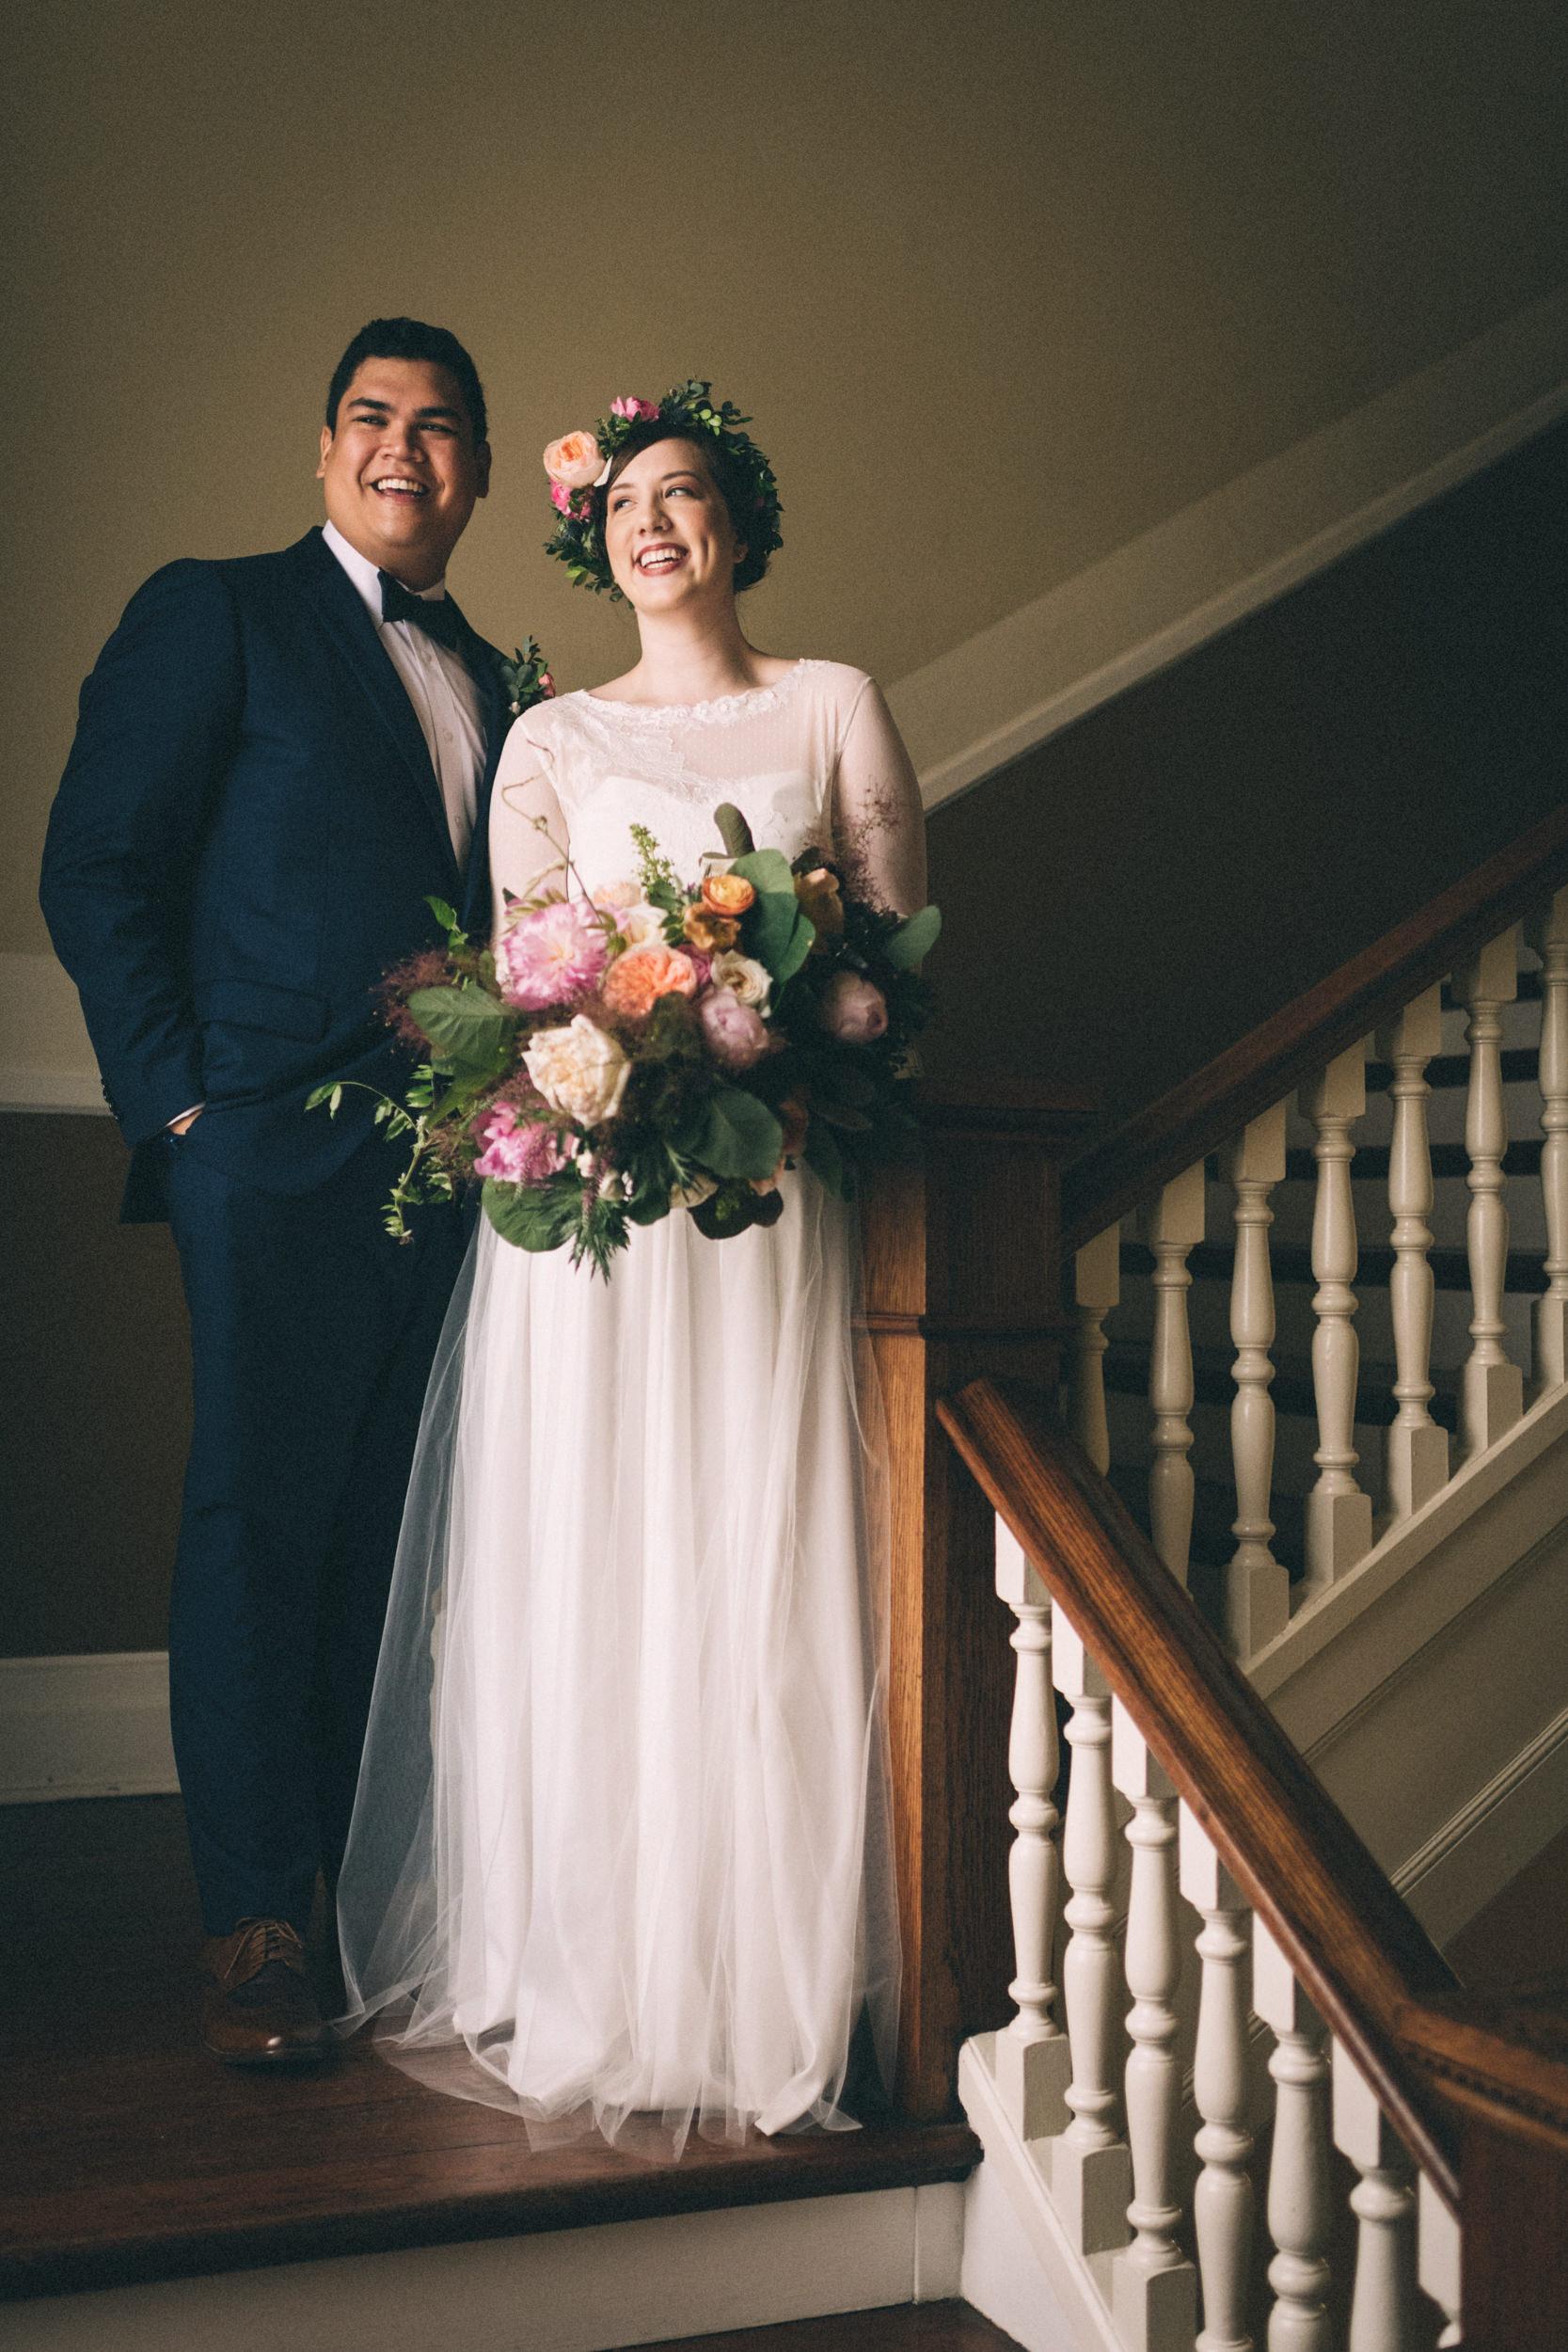 lauren-dean-wedding-grand-lodge-kentucky-sarah-katherine-davis-photography-168edit.jpg